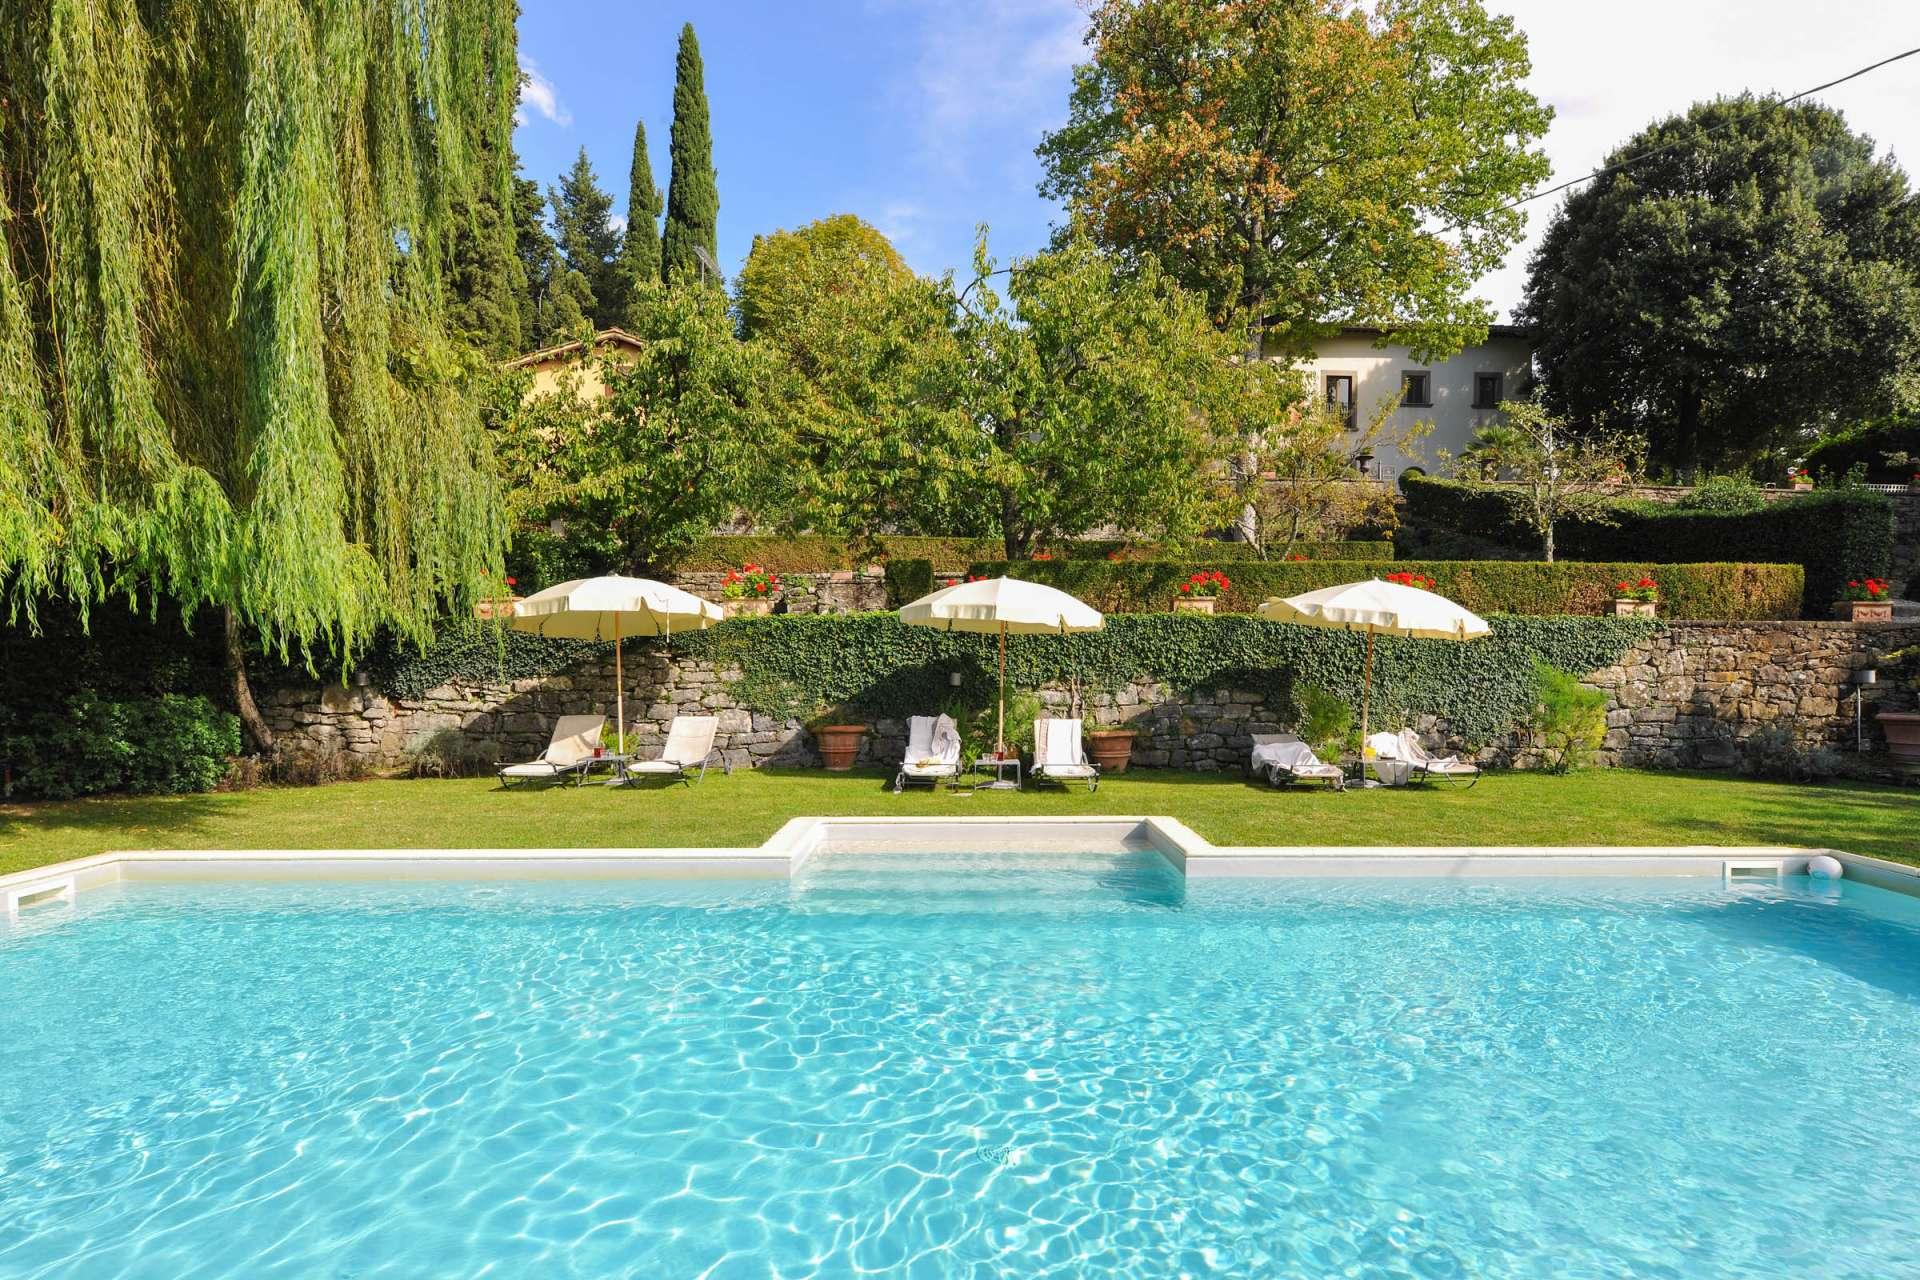 Auto Villa Outlet >> Villa Di Masseto 10 Bed Luxury Villa With Pool Florence